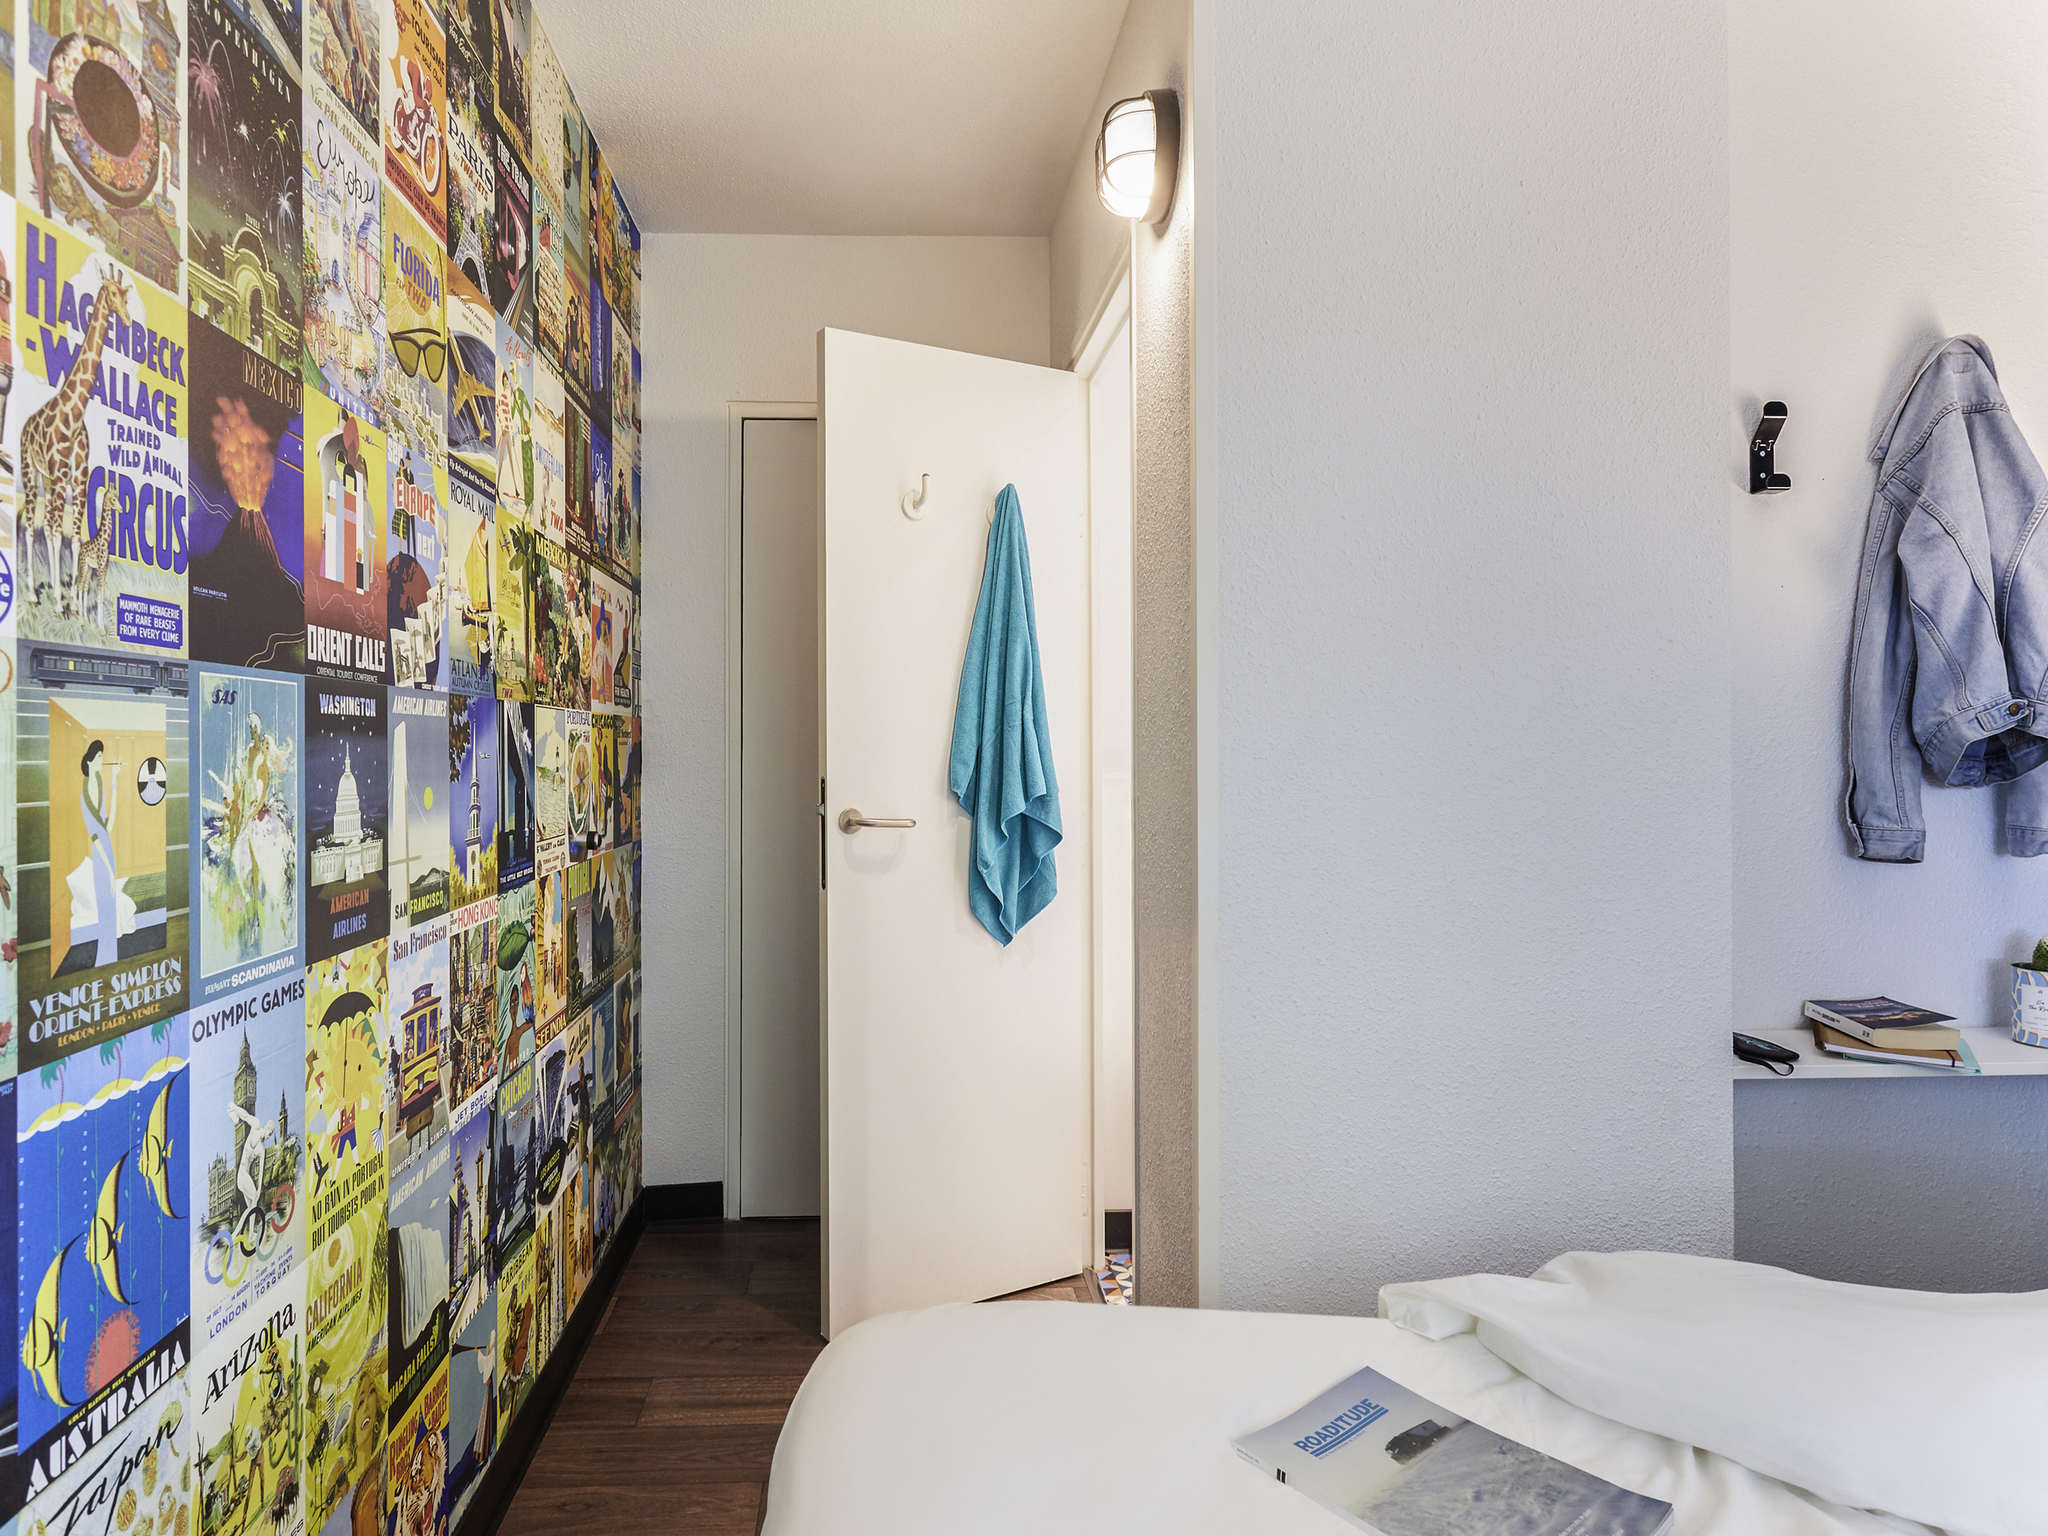 Hotel - hotelF1 Marne la Vallée Collégien